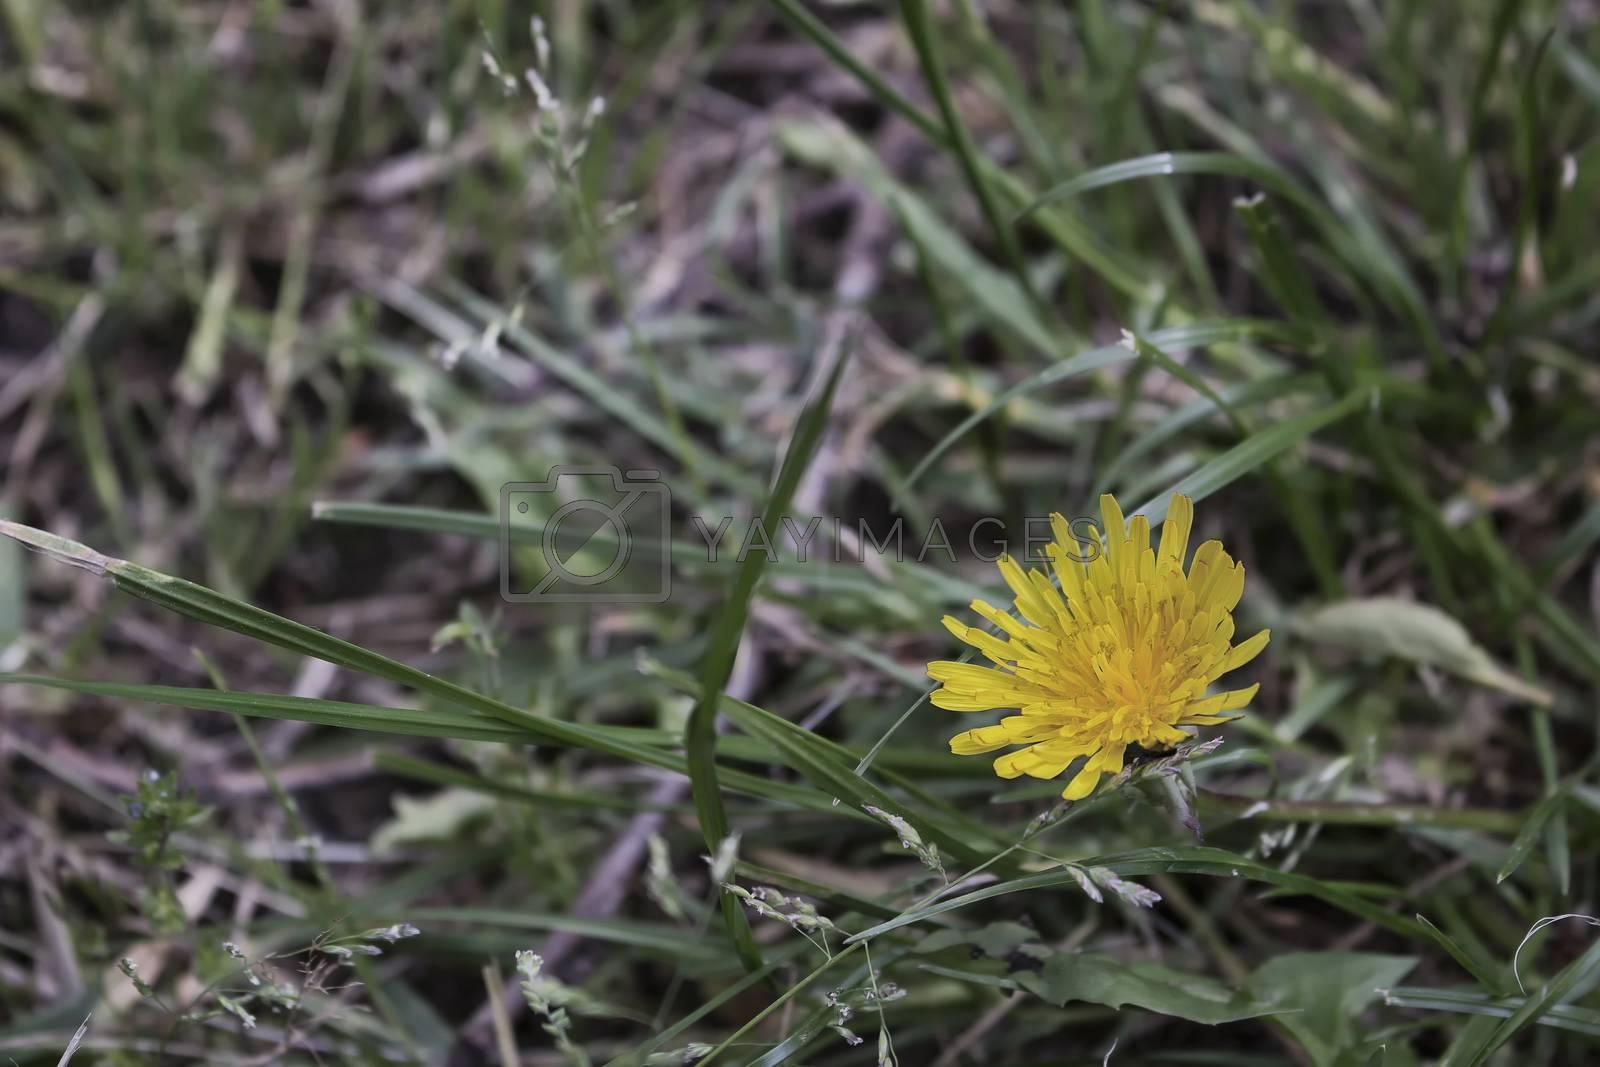 Dandelion flower on green weeds background in Italian countryside